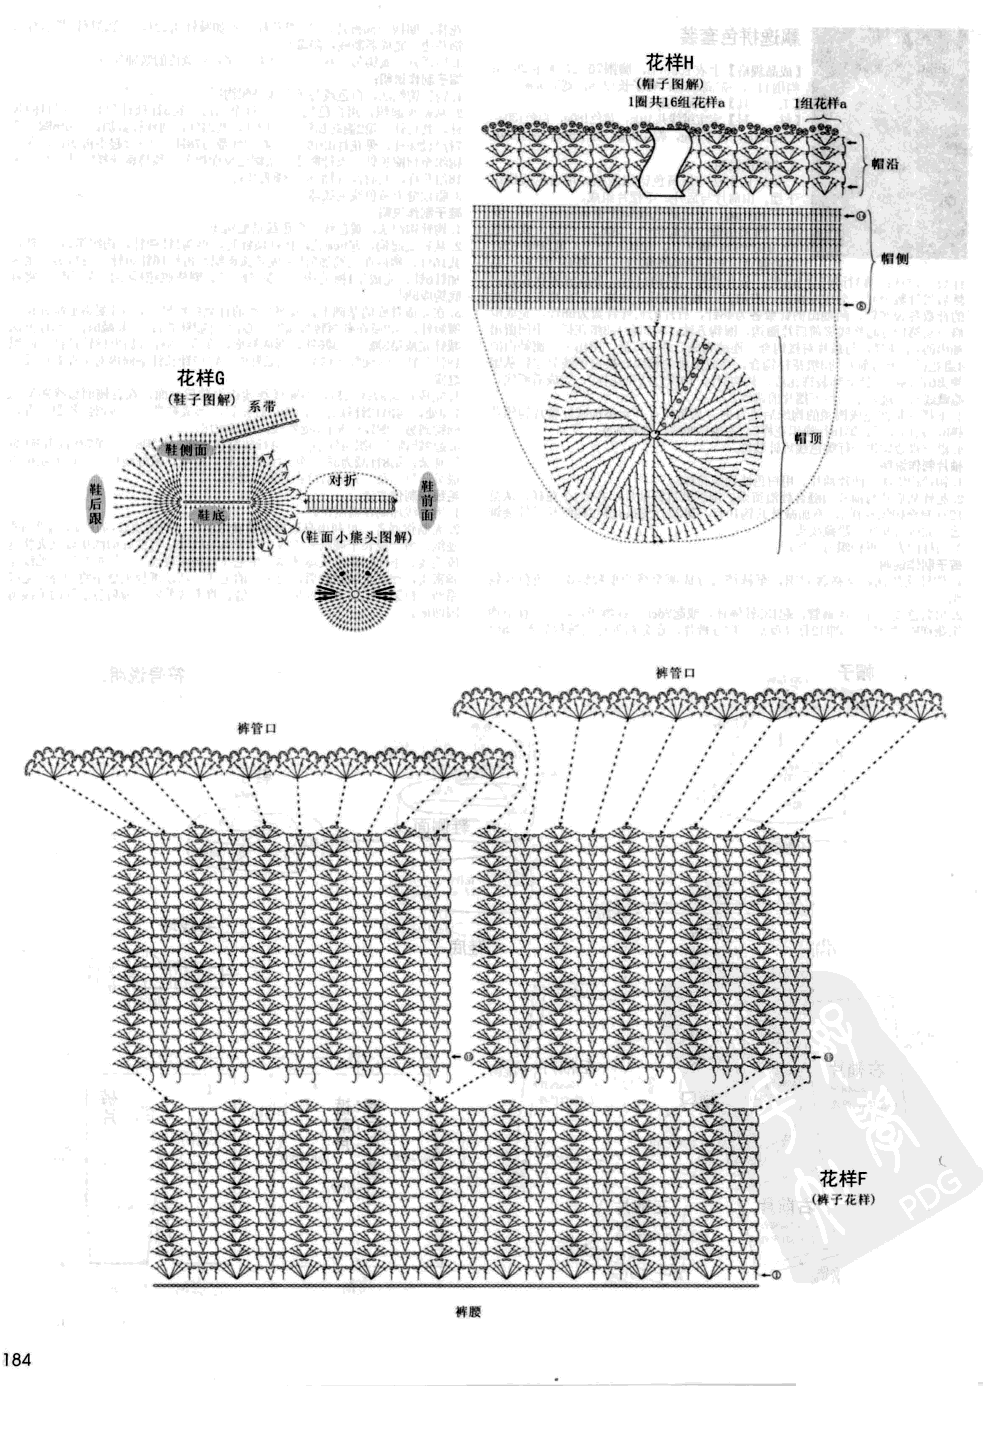 p (184).jpg